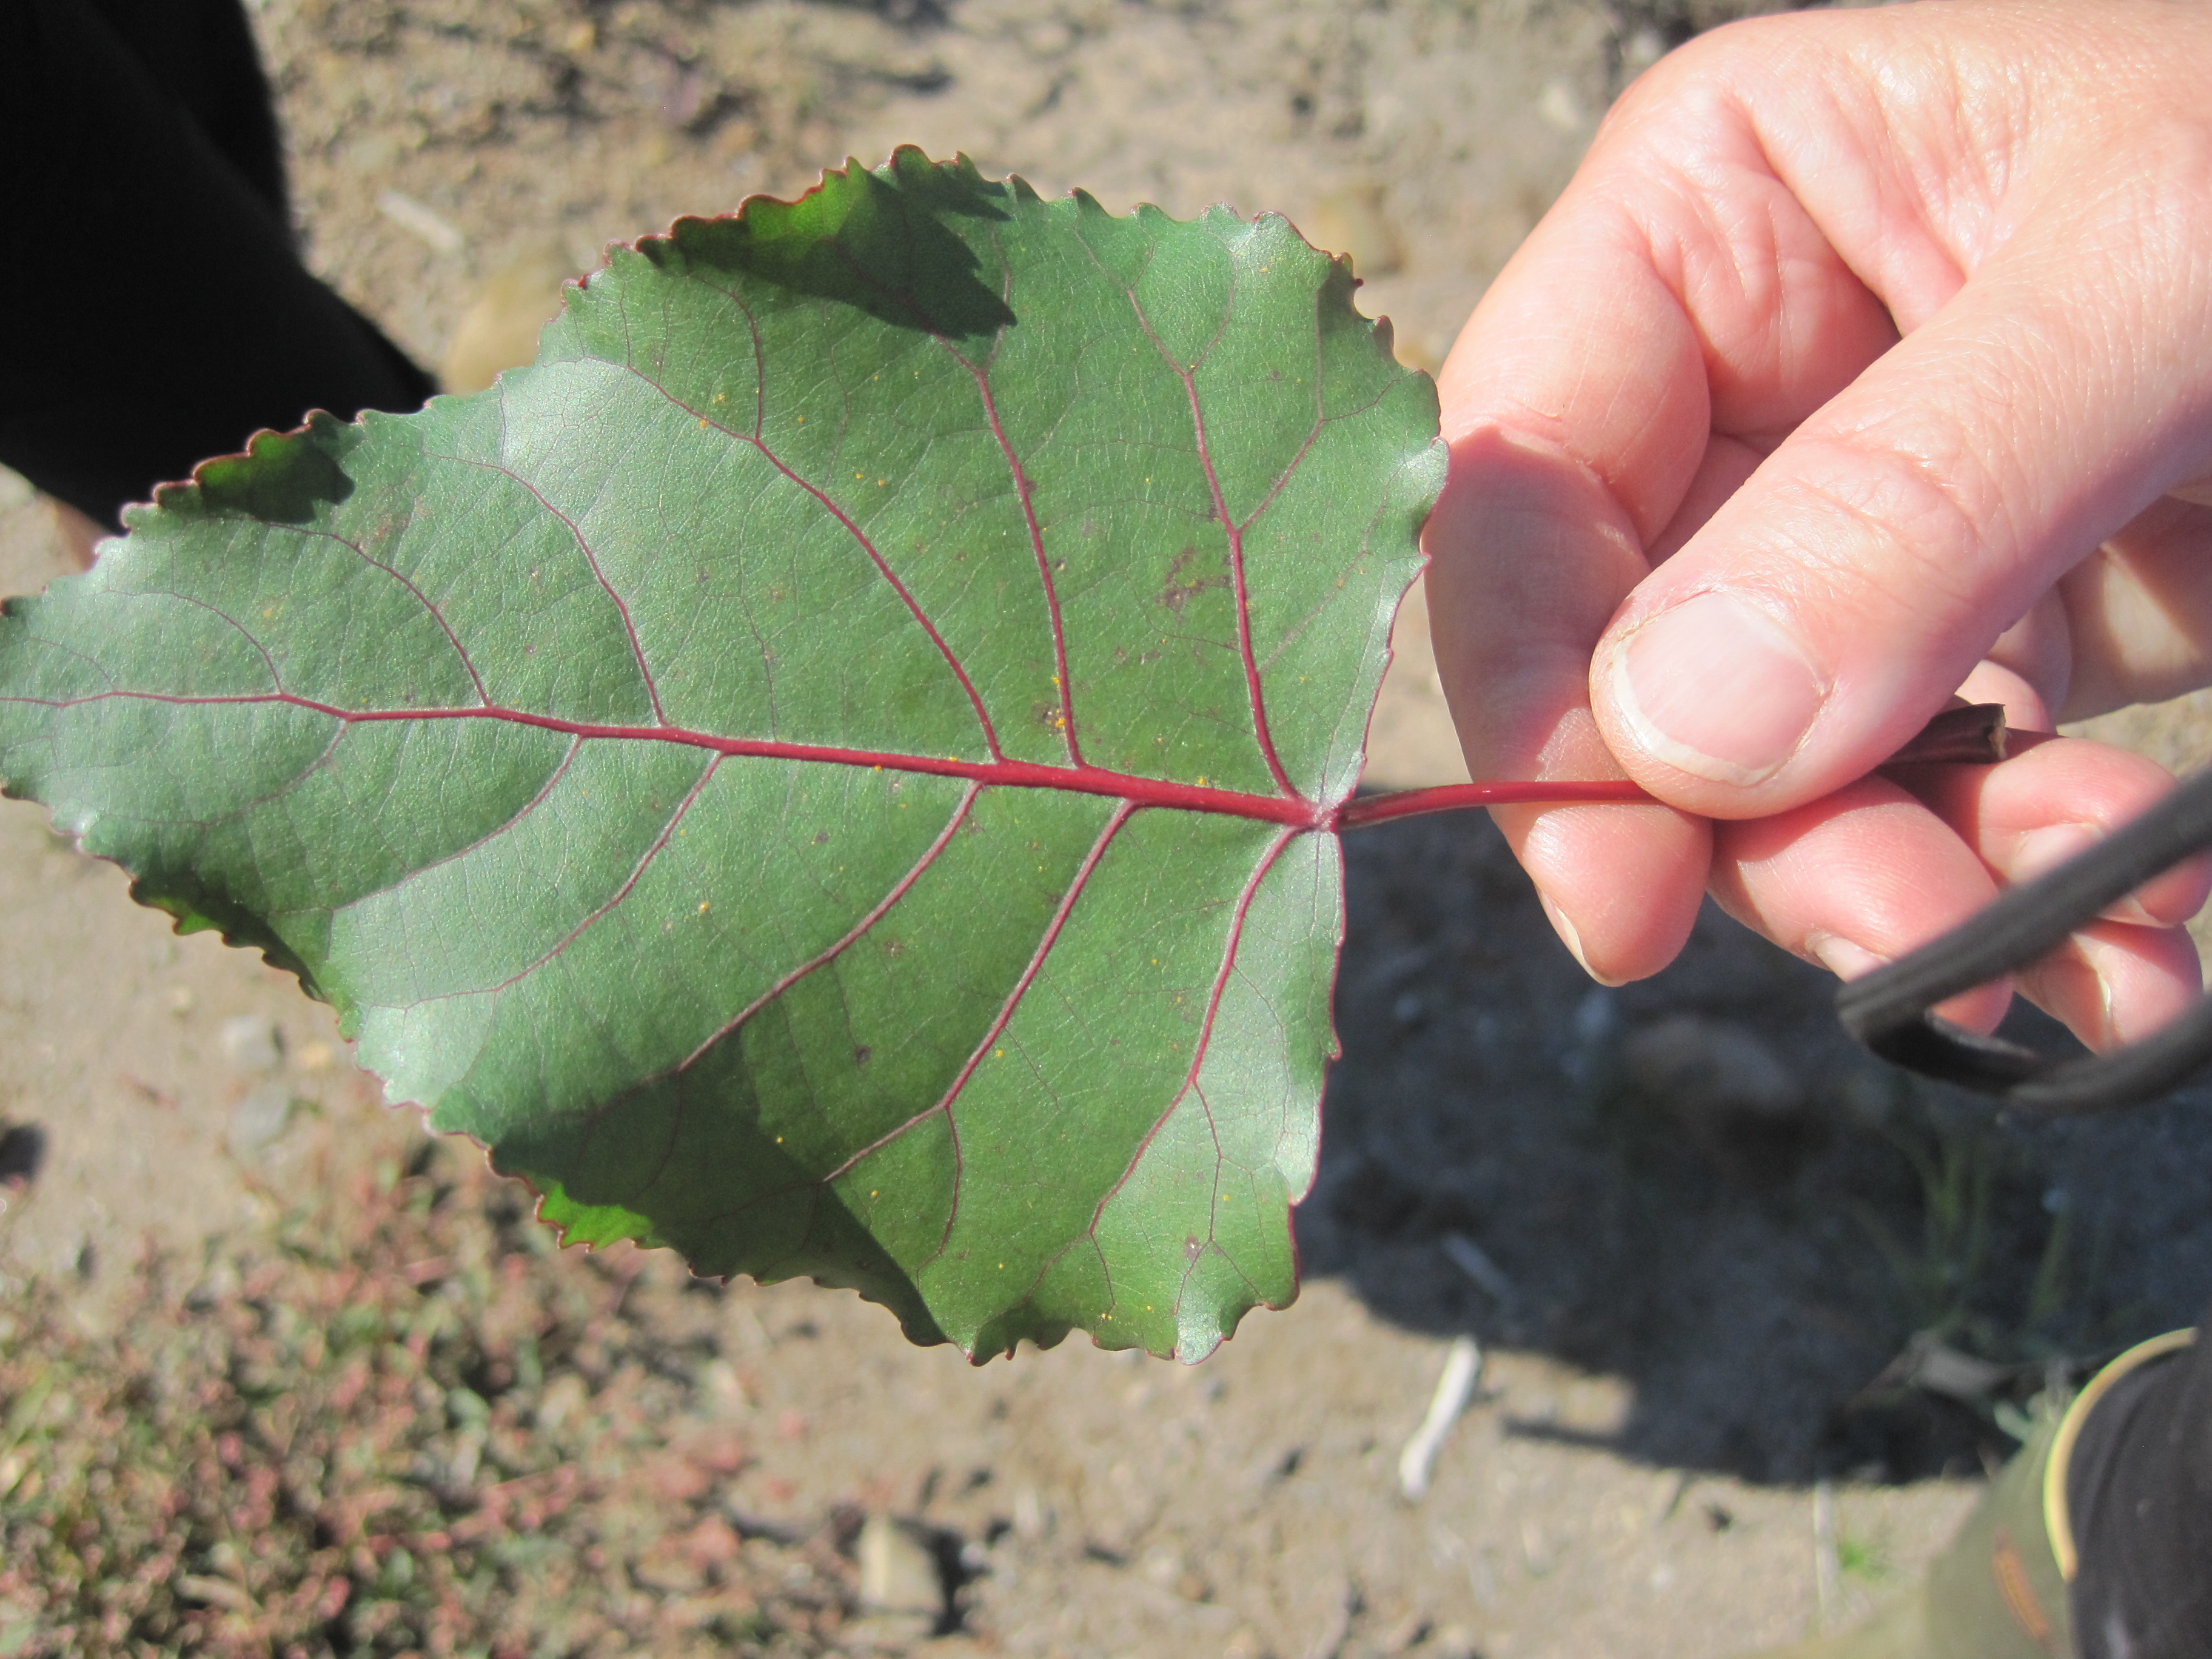 leaf-hand-cottonwood-sapling